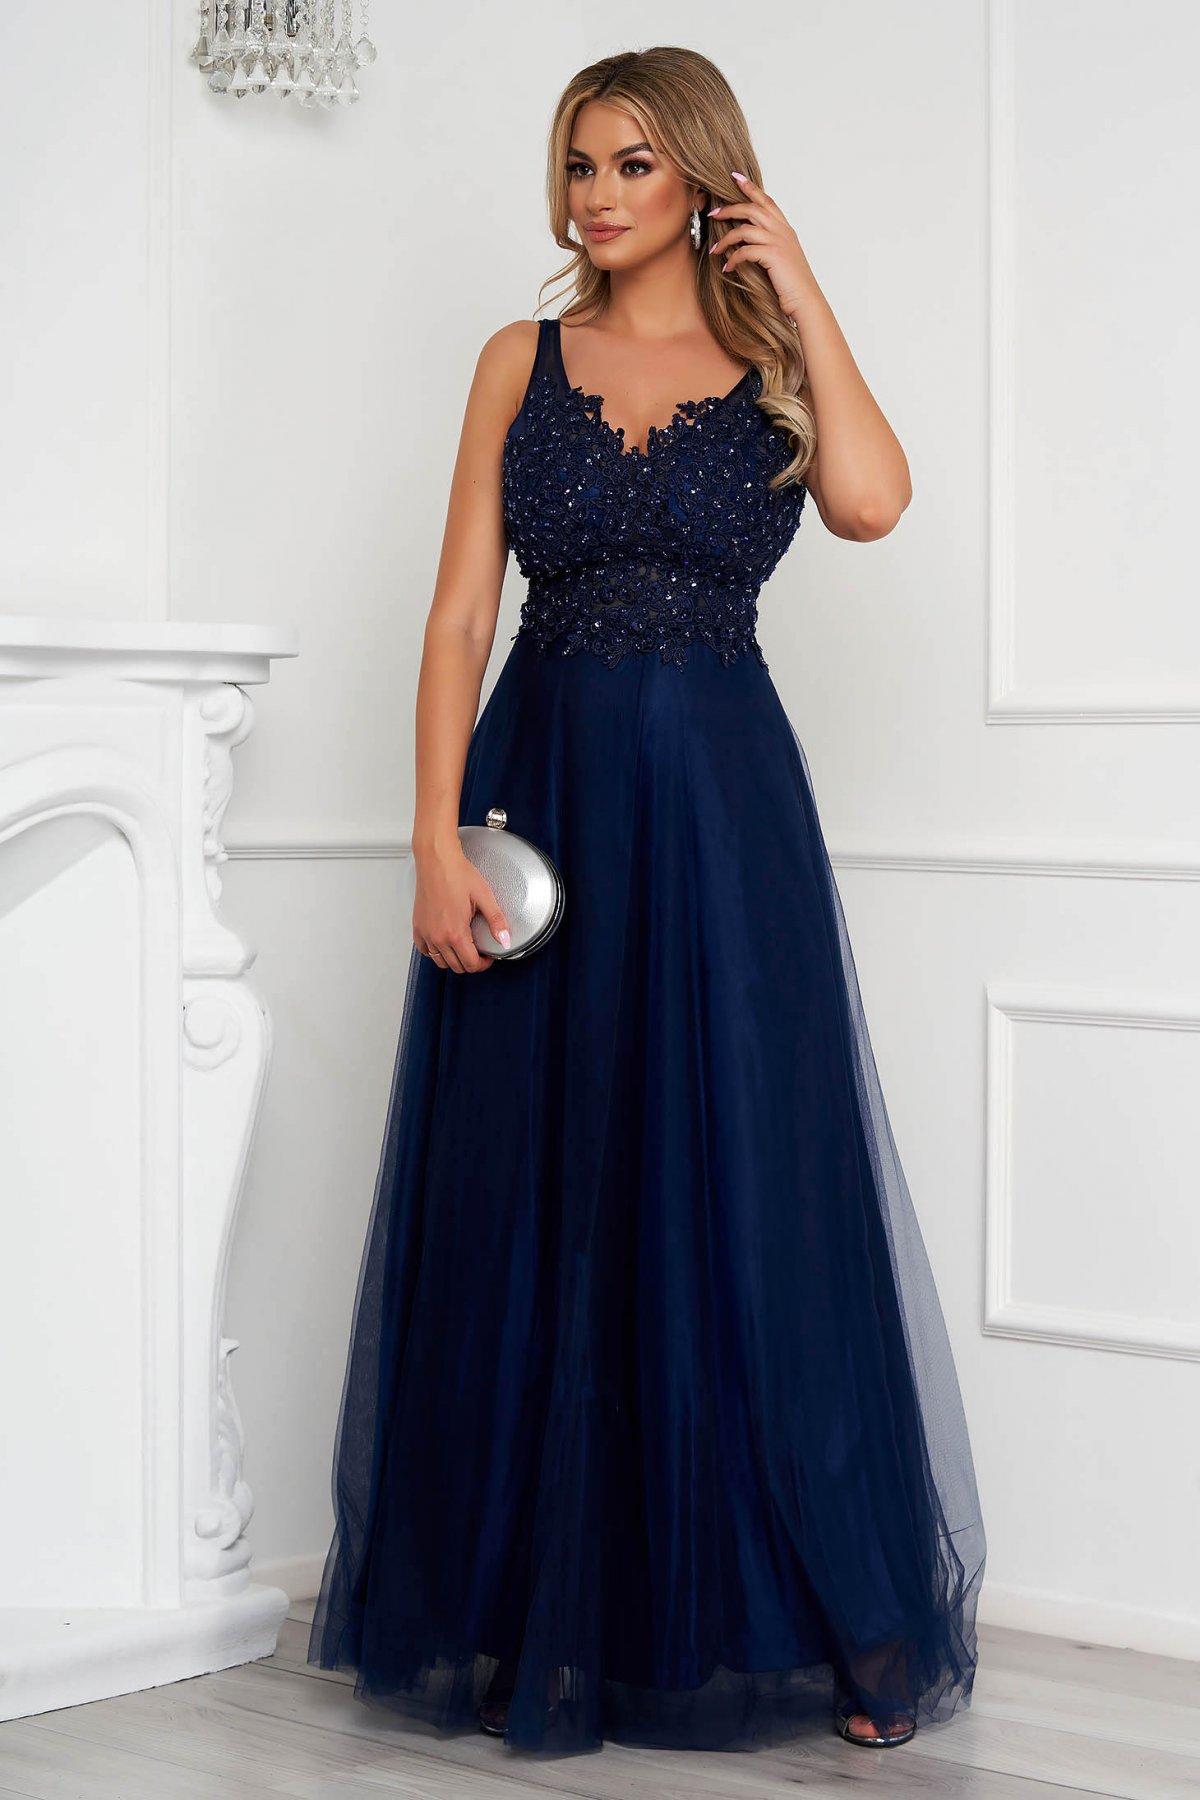 Rochie albastru-inchis lunga de ocazie in clos din tul cu broderie si aplicatii cu paiete si perle - medelin.ro